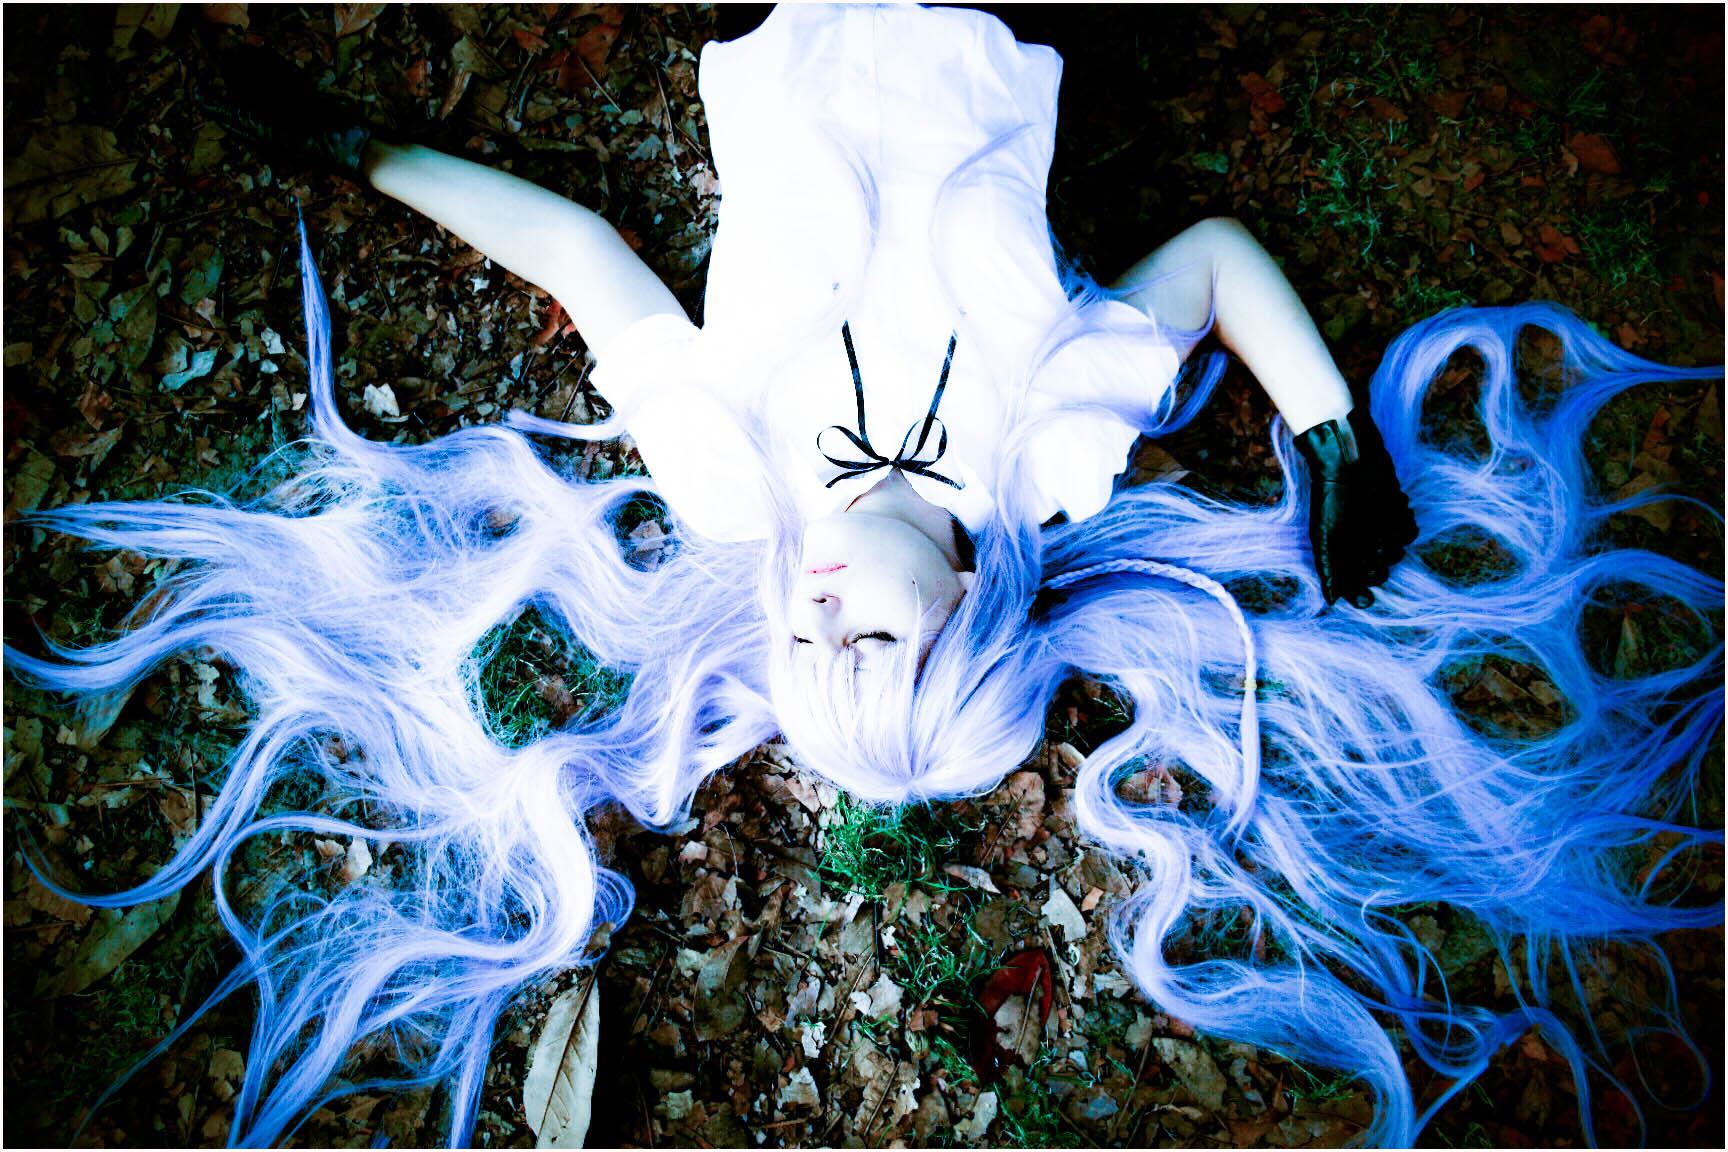 Kirigiri - The sleeping beauty by EvilAkayaKirihara